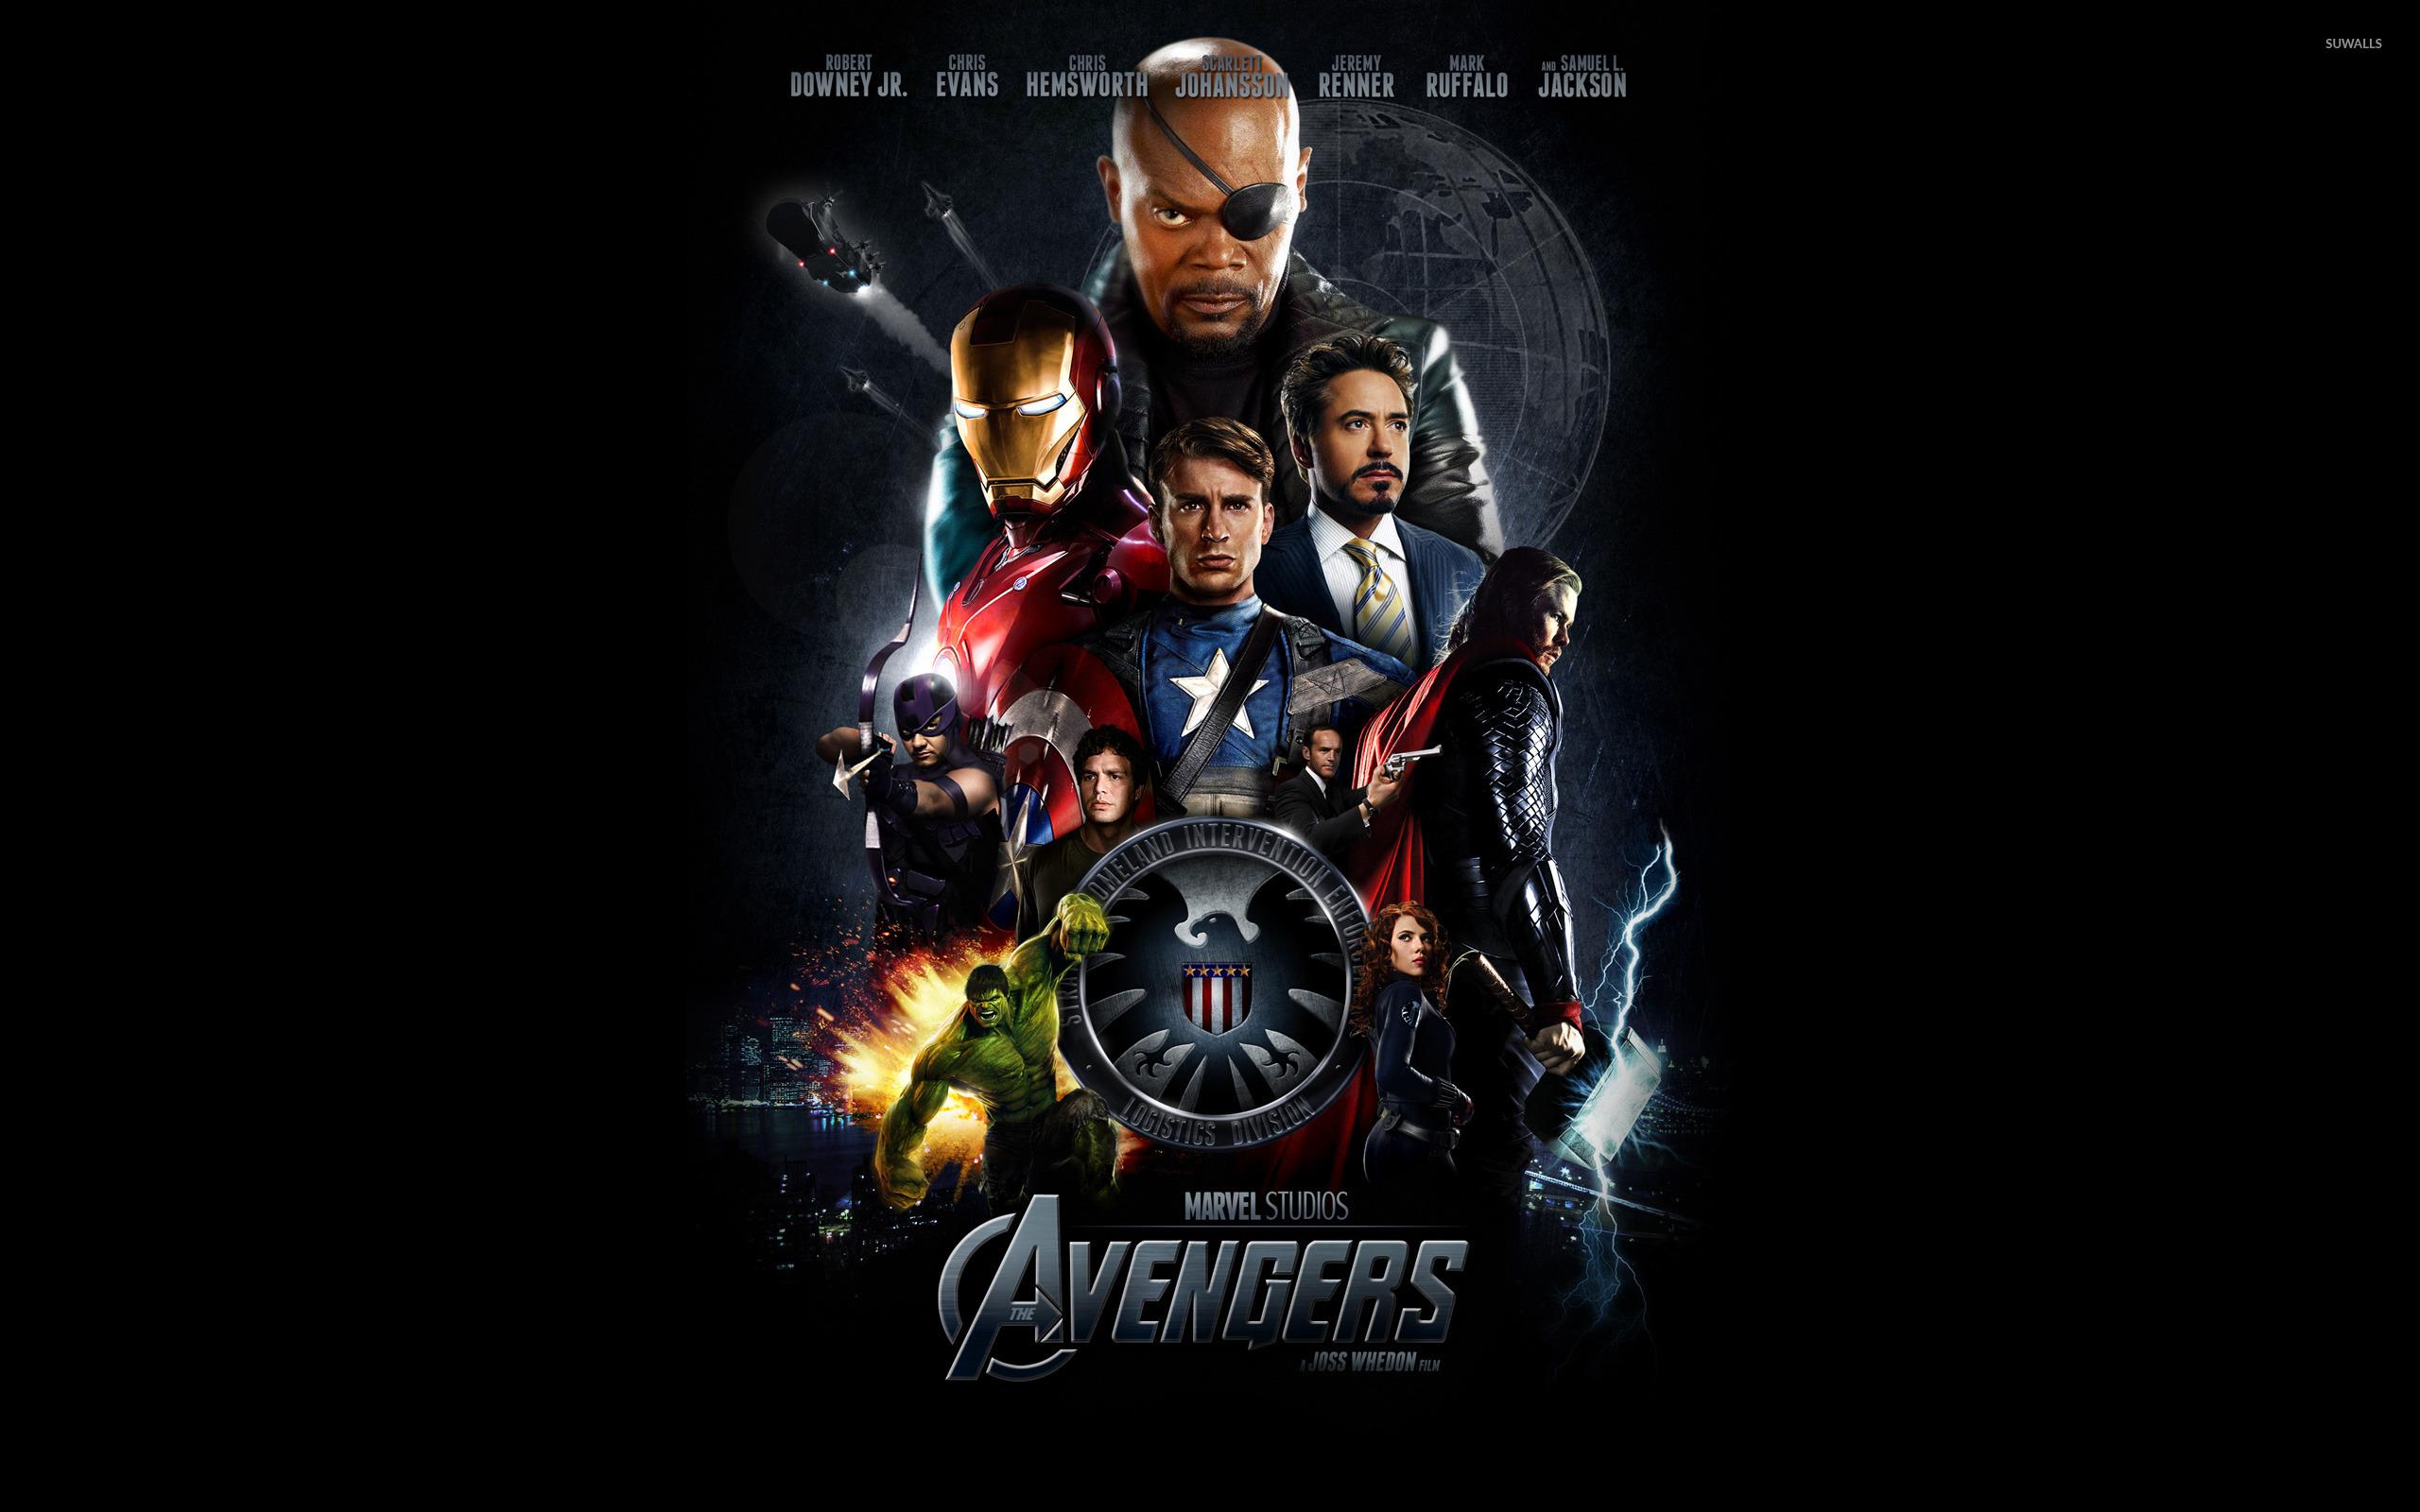 Avengers 4 Wallpapers